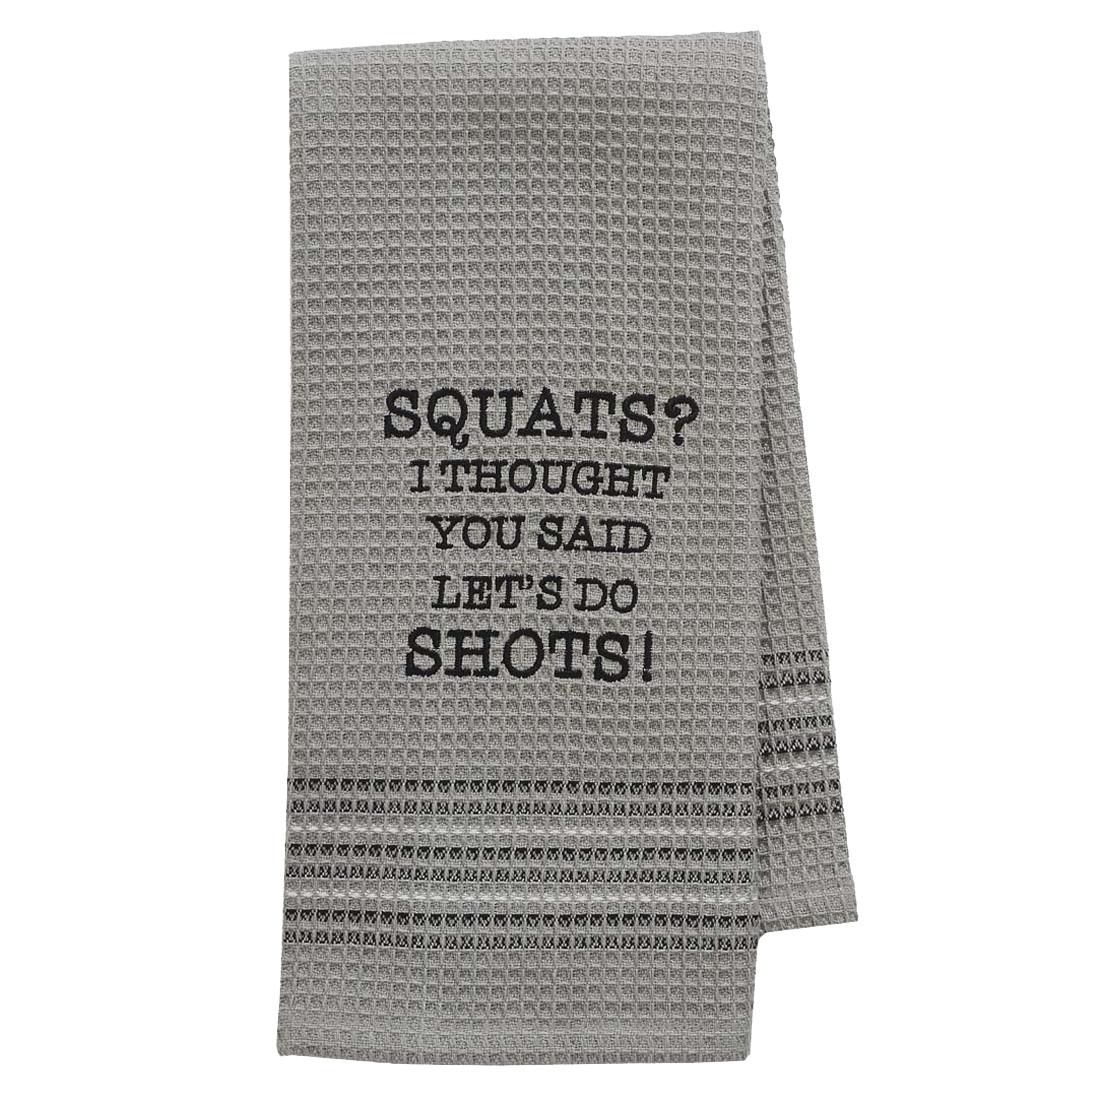 Funny Novelty Cotton Kitchen Dishtowel Squats or Shots